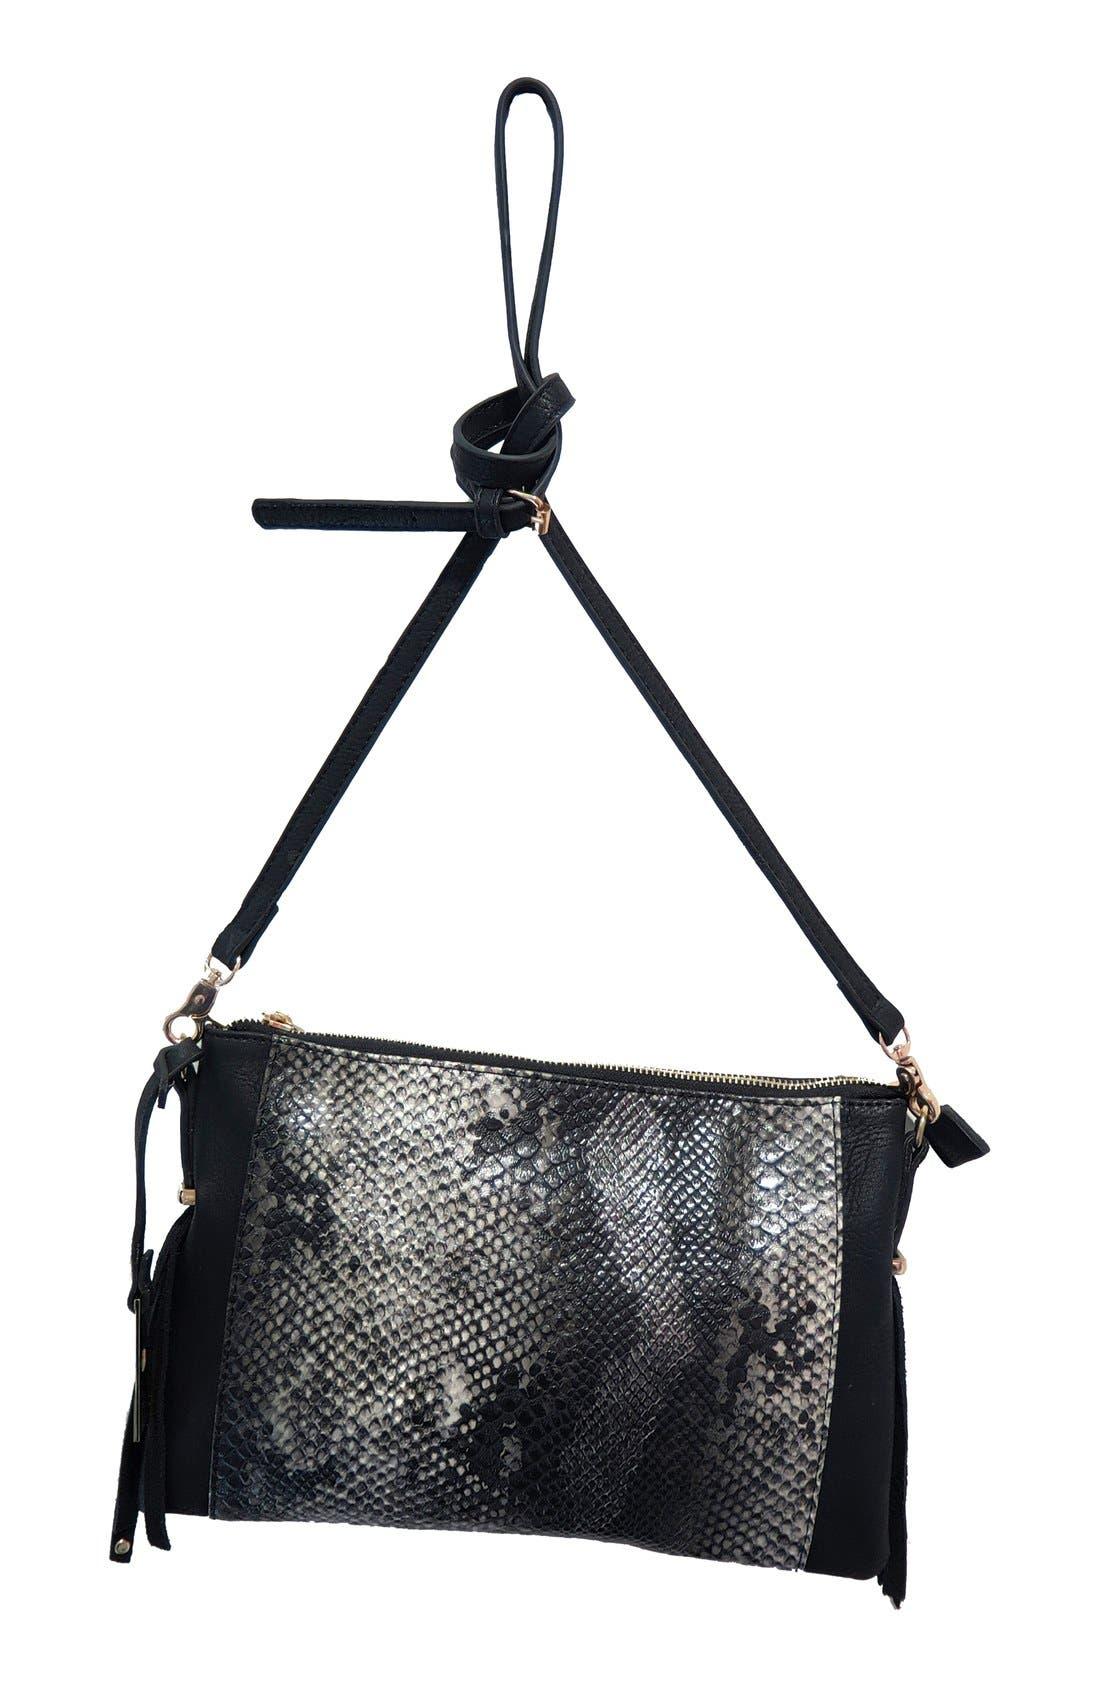 'Infinity' Snake Embossed Convertible Vegan Leather Crossbody Bag,                             Main thumbnail 1, color,                             Black Snake